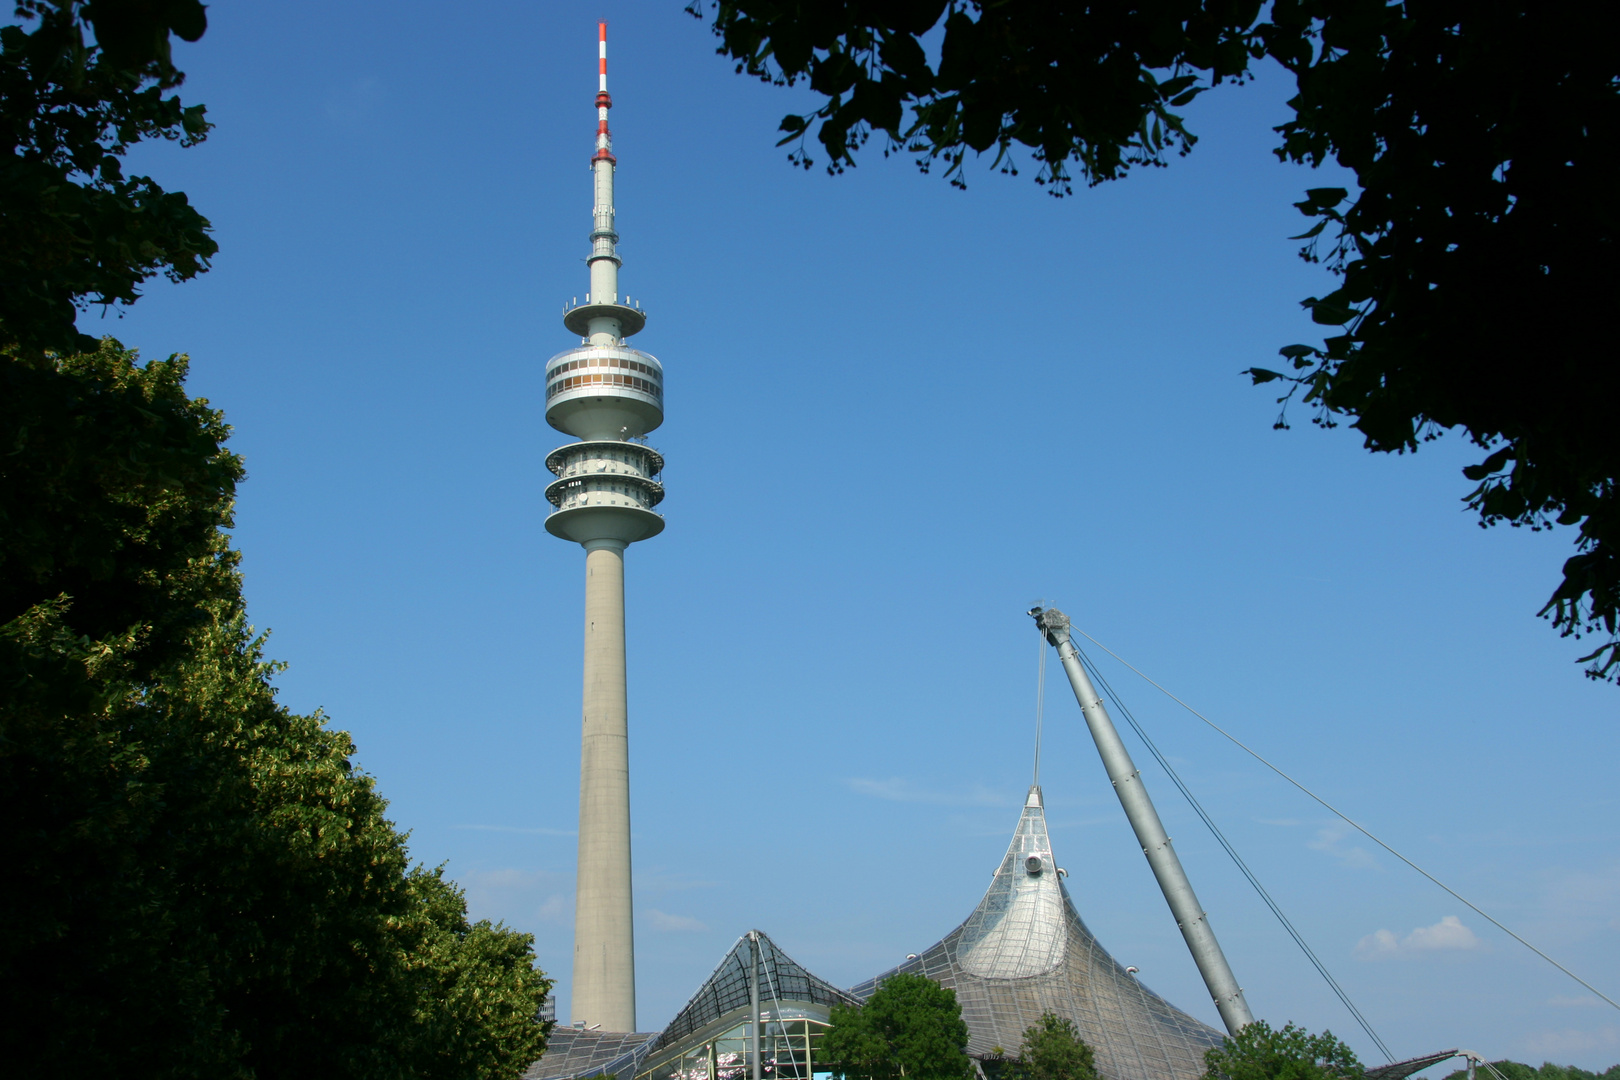 Olypiapark München